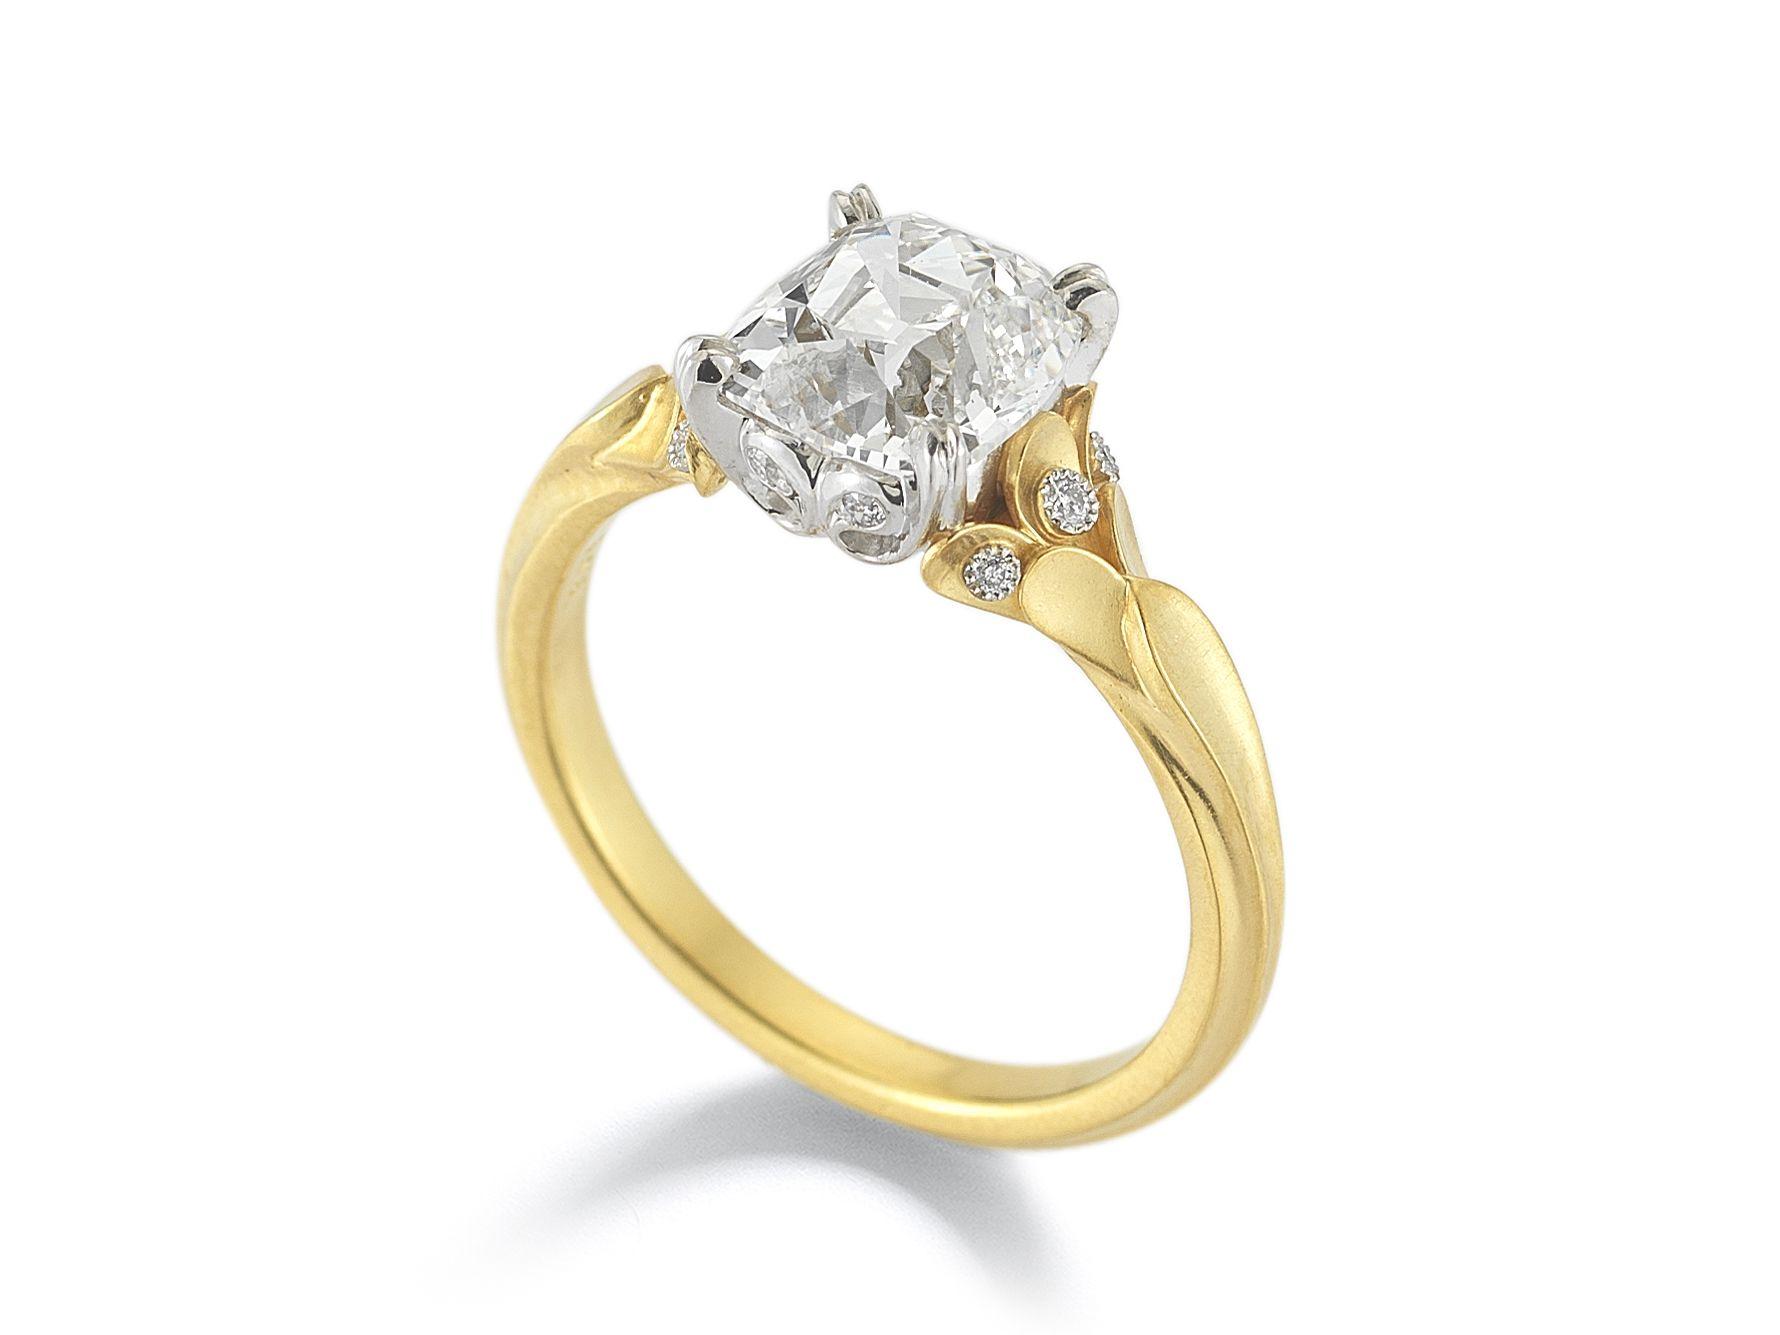 Antique Cushion Cut Diamond Classic Flora Ring, 18Kt & Platinum   McTeigue…